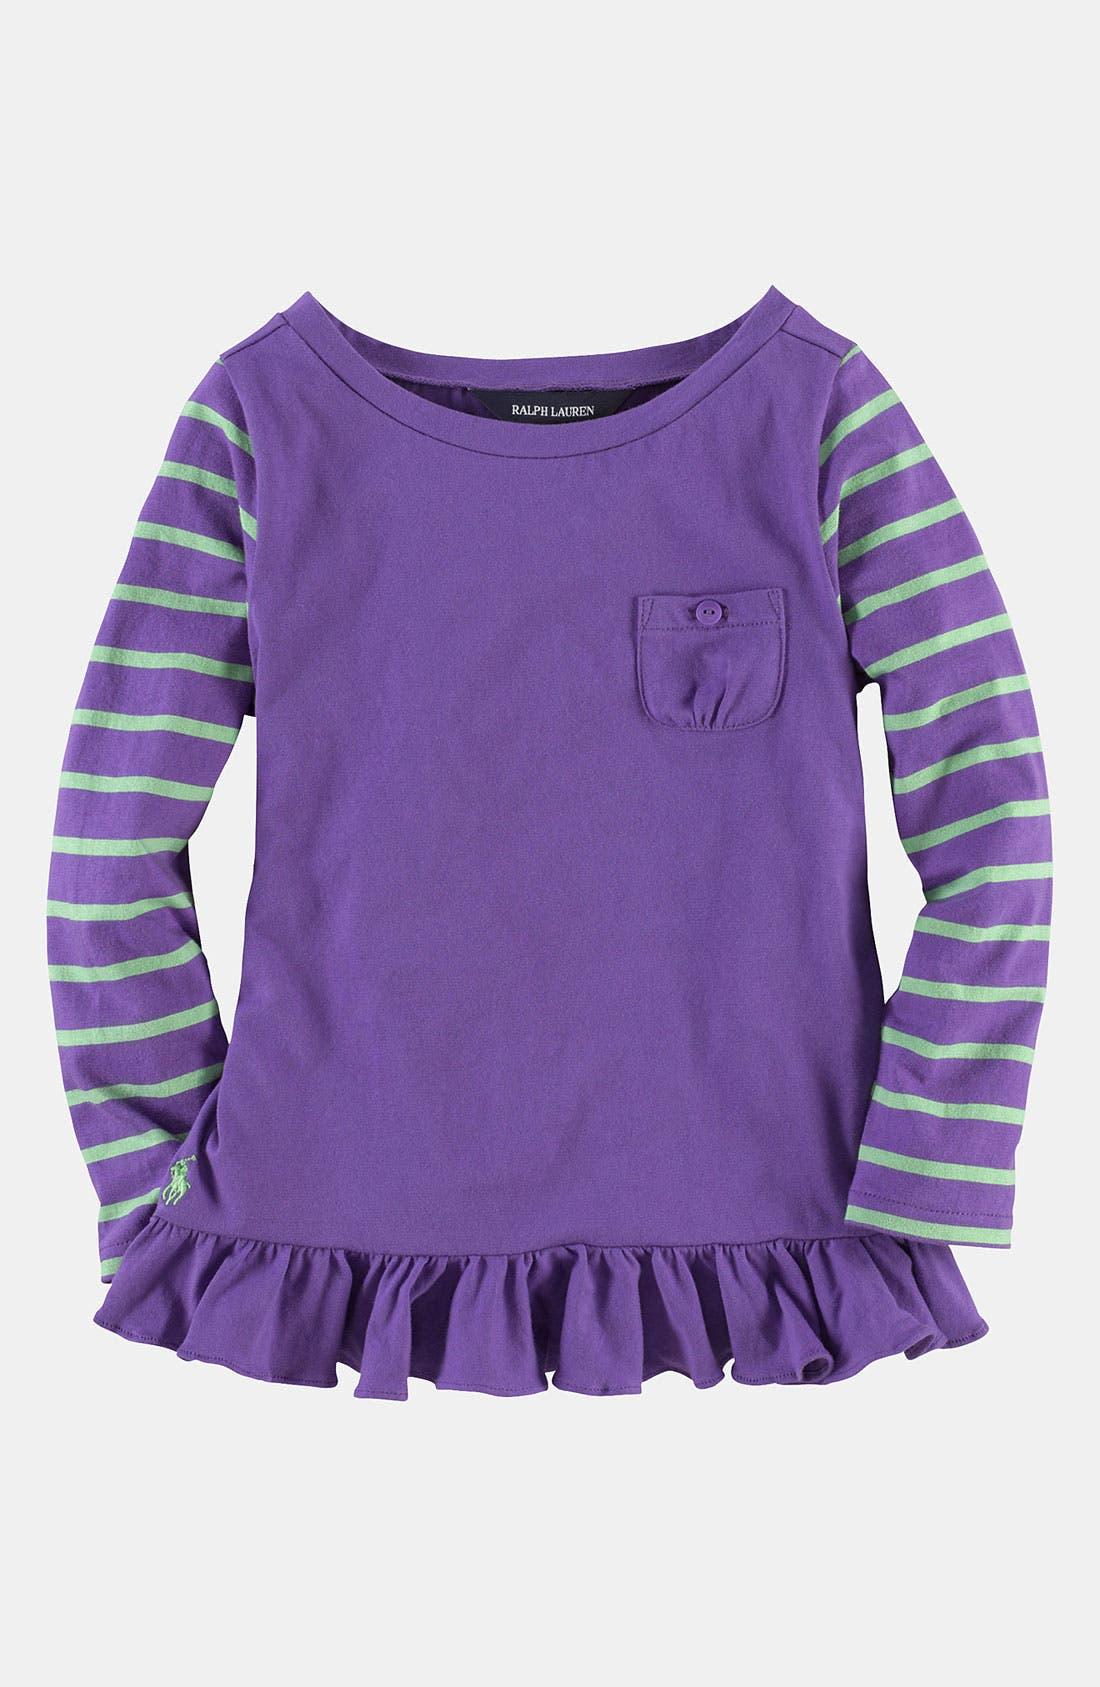 Alternate Image 1 Selected - Ralph Lauren Stripe Sleeve Tee (Toddler)